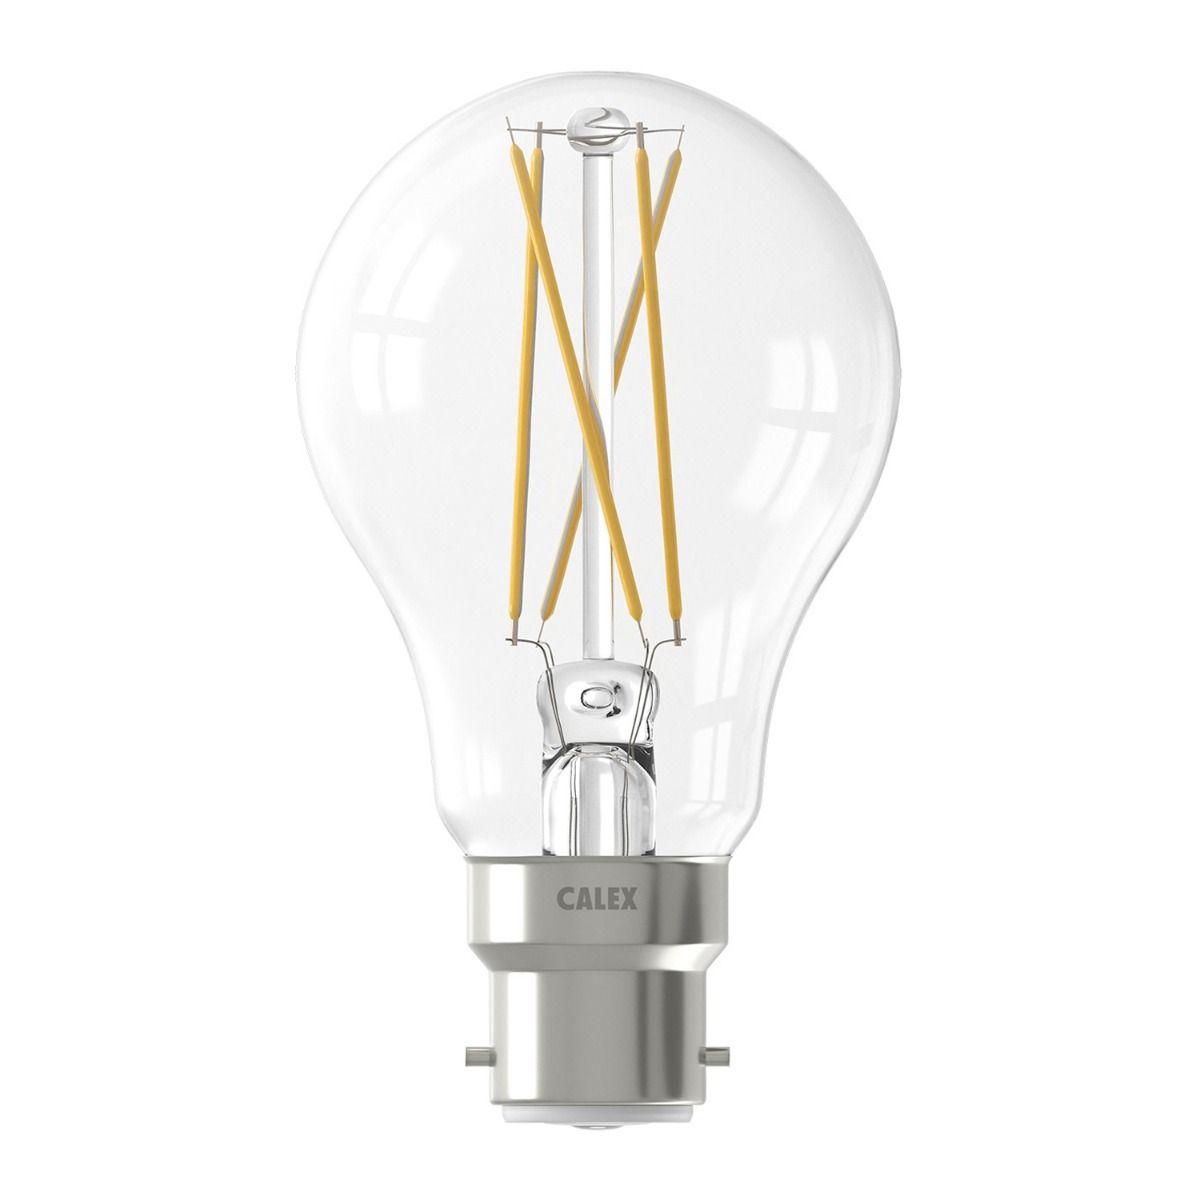 Calex Smart Standard LED Glühbirne B22 7W 806lm 1800-3000K Fadenlampe   Tuya Wifi